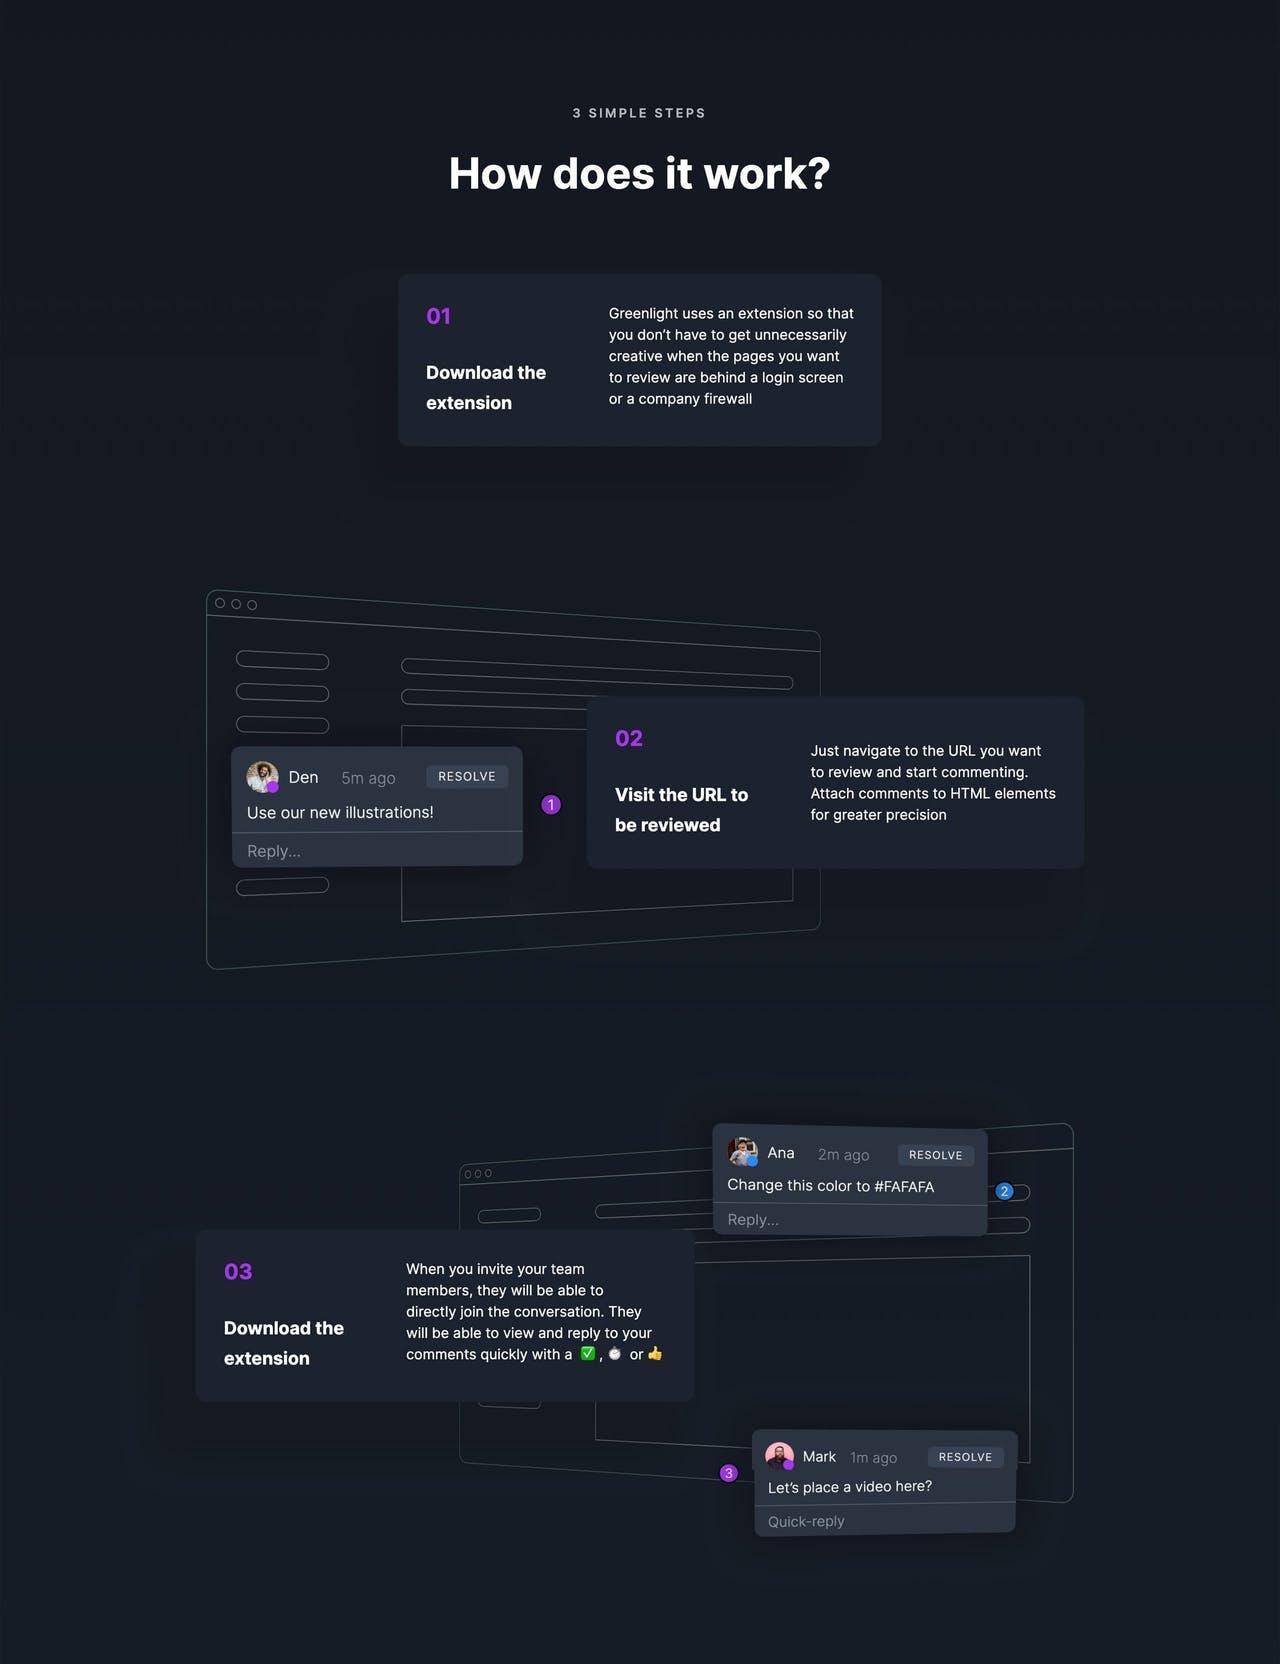 How It Works - Greenlight Screenshot